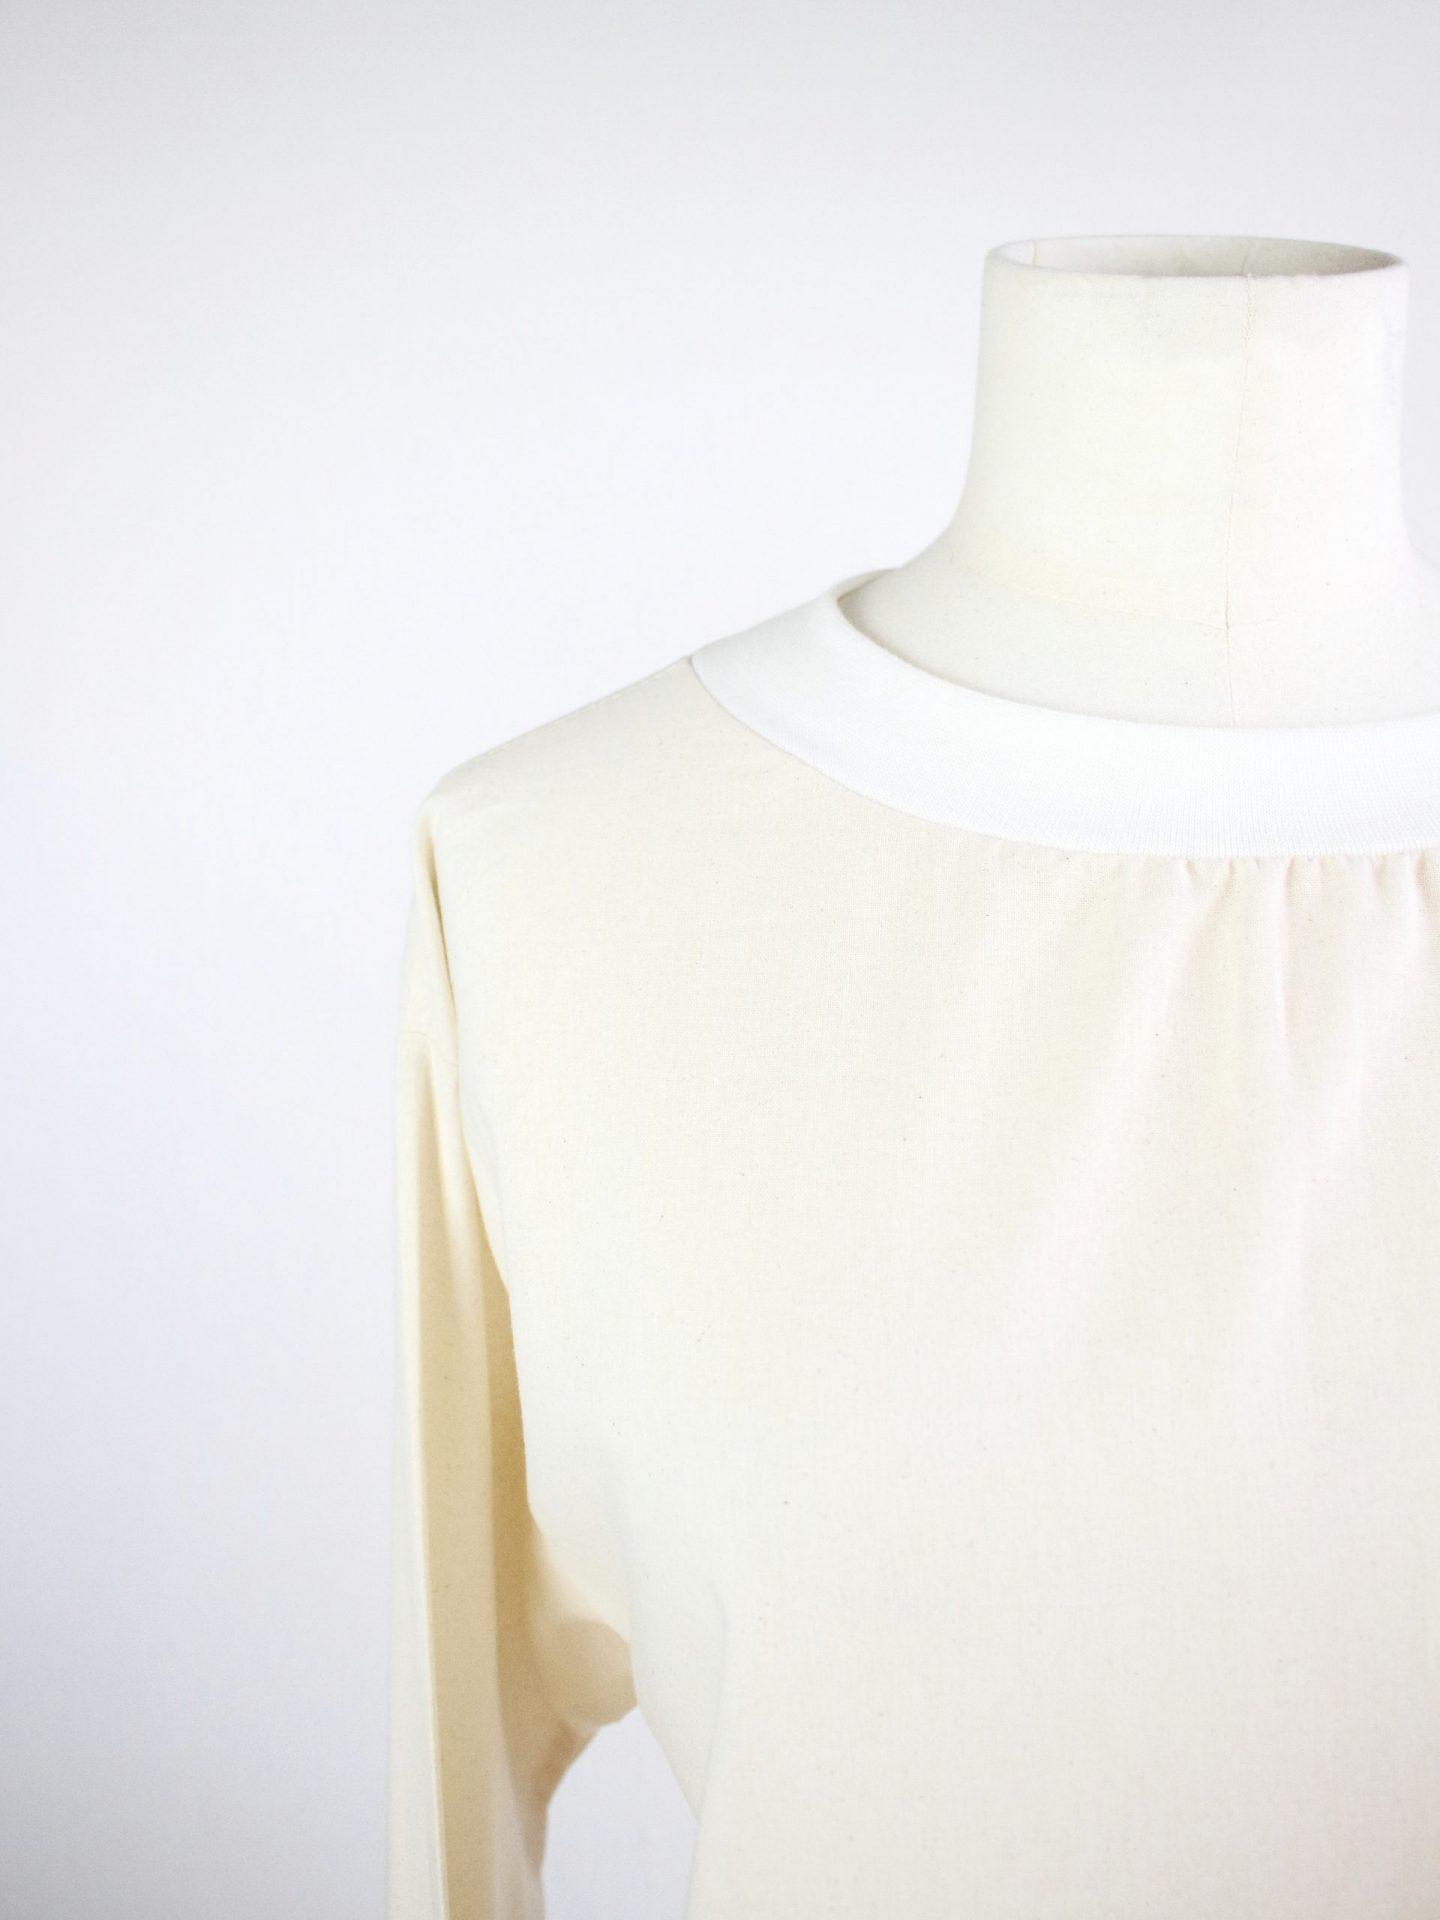 Unisex fashion tailored in Reykjavik